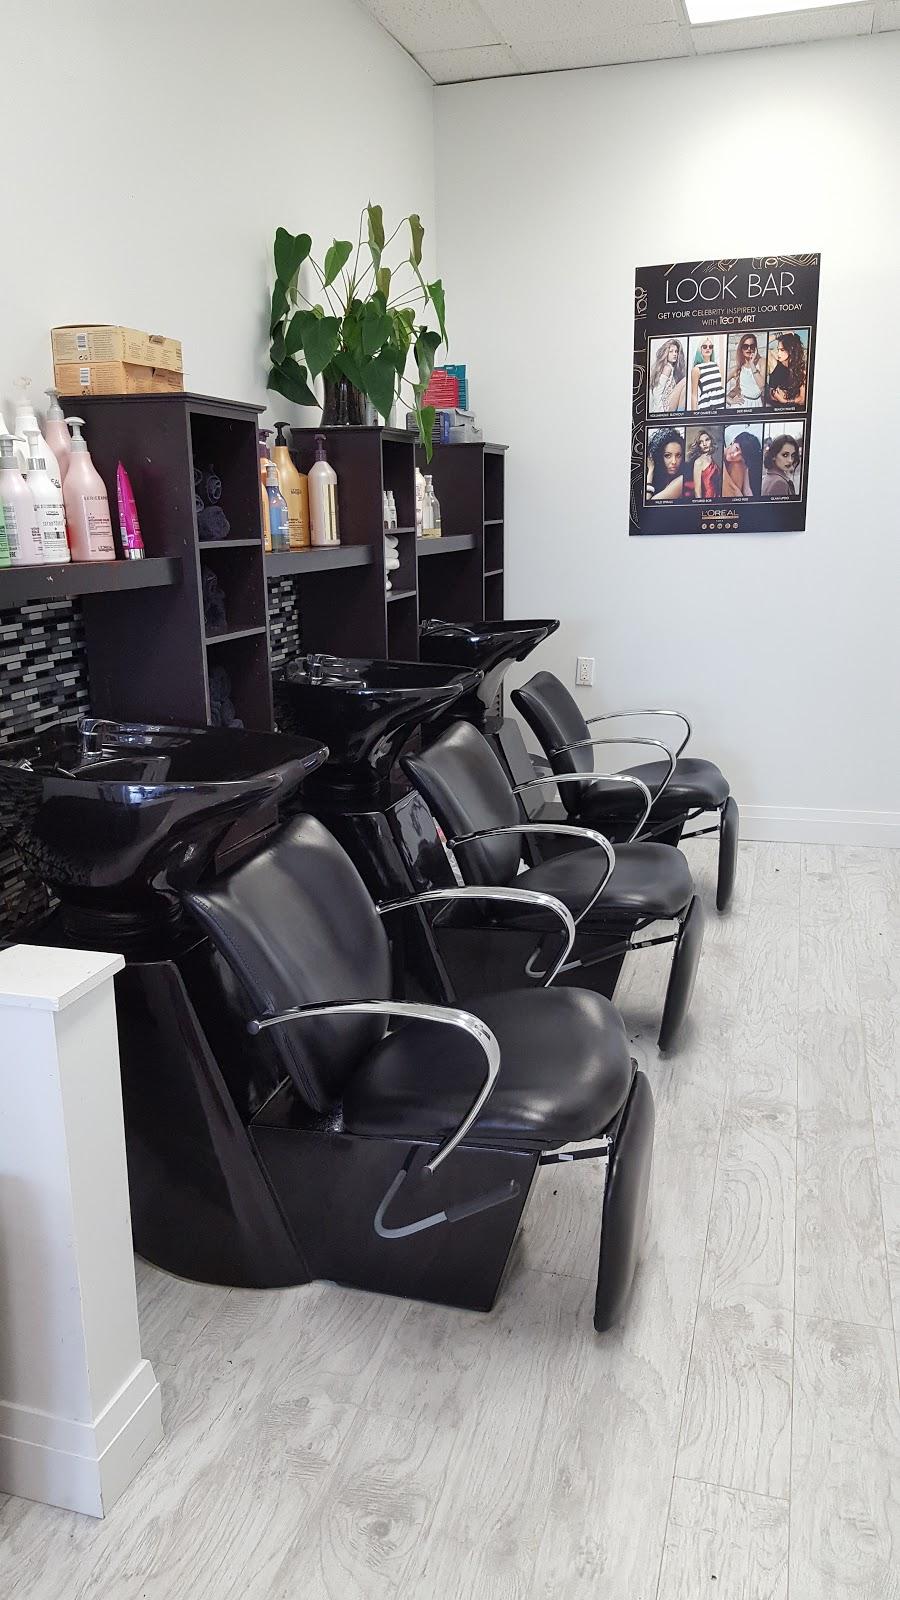 Shine Salon and Spa | hair care | 621 King St E #3, Oshawa, ON L1H 1G3, Canada | 9052400220 OR +1 905-240-0220